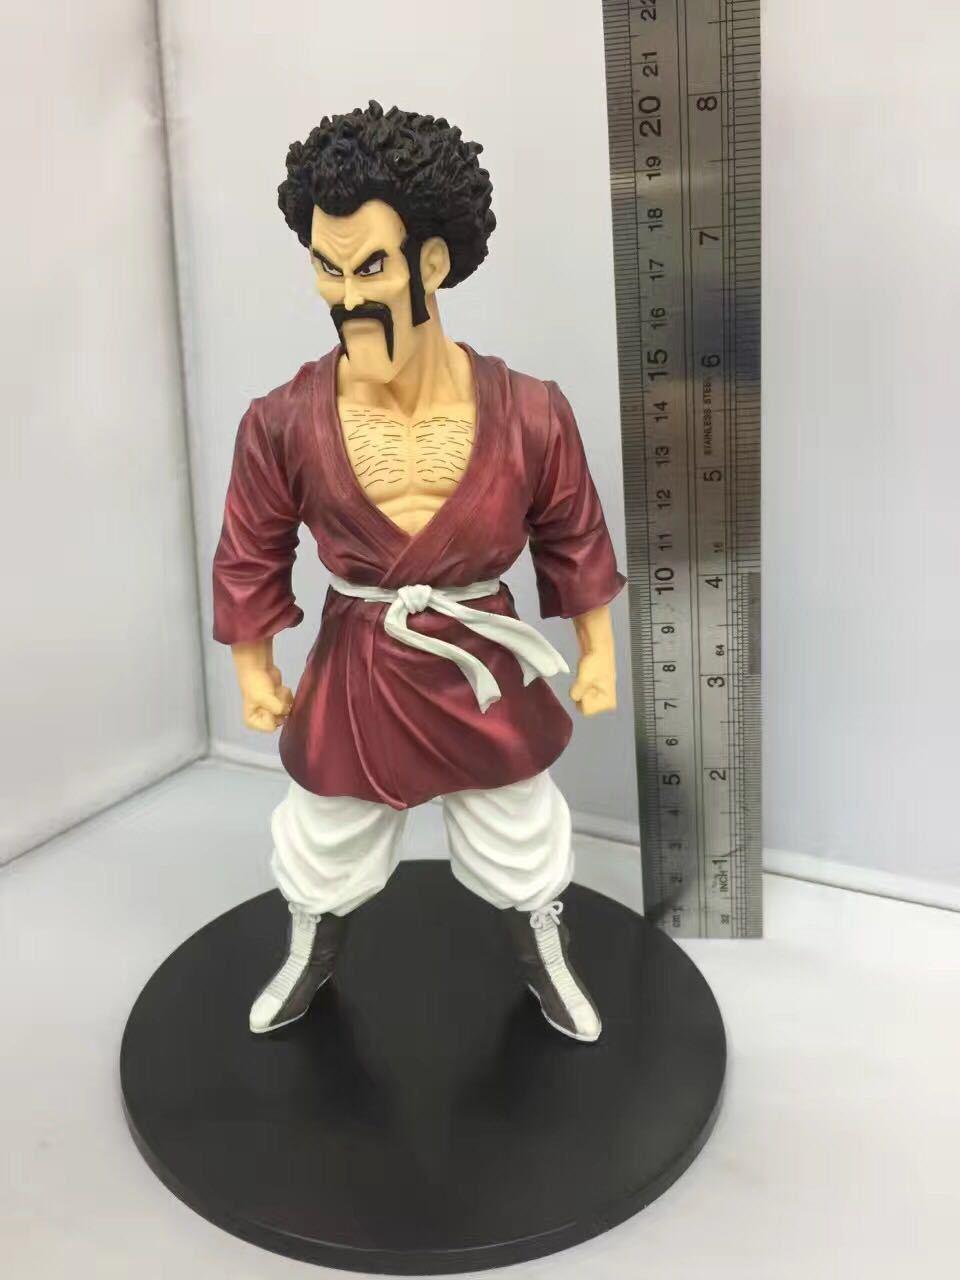 20cm Dragon Ball Z Action Figure Hercule Mark Satan PVC Figurine Hero Collectible Model toys good gift toy good homelessness 20cm